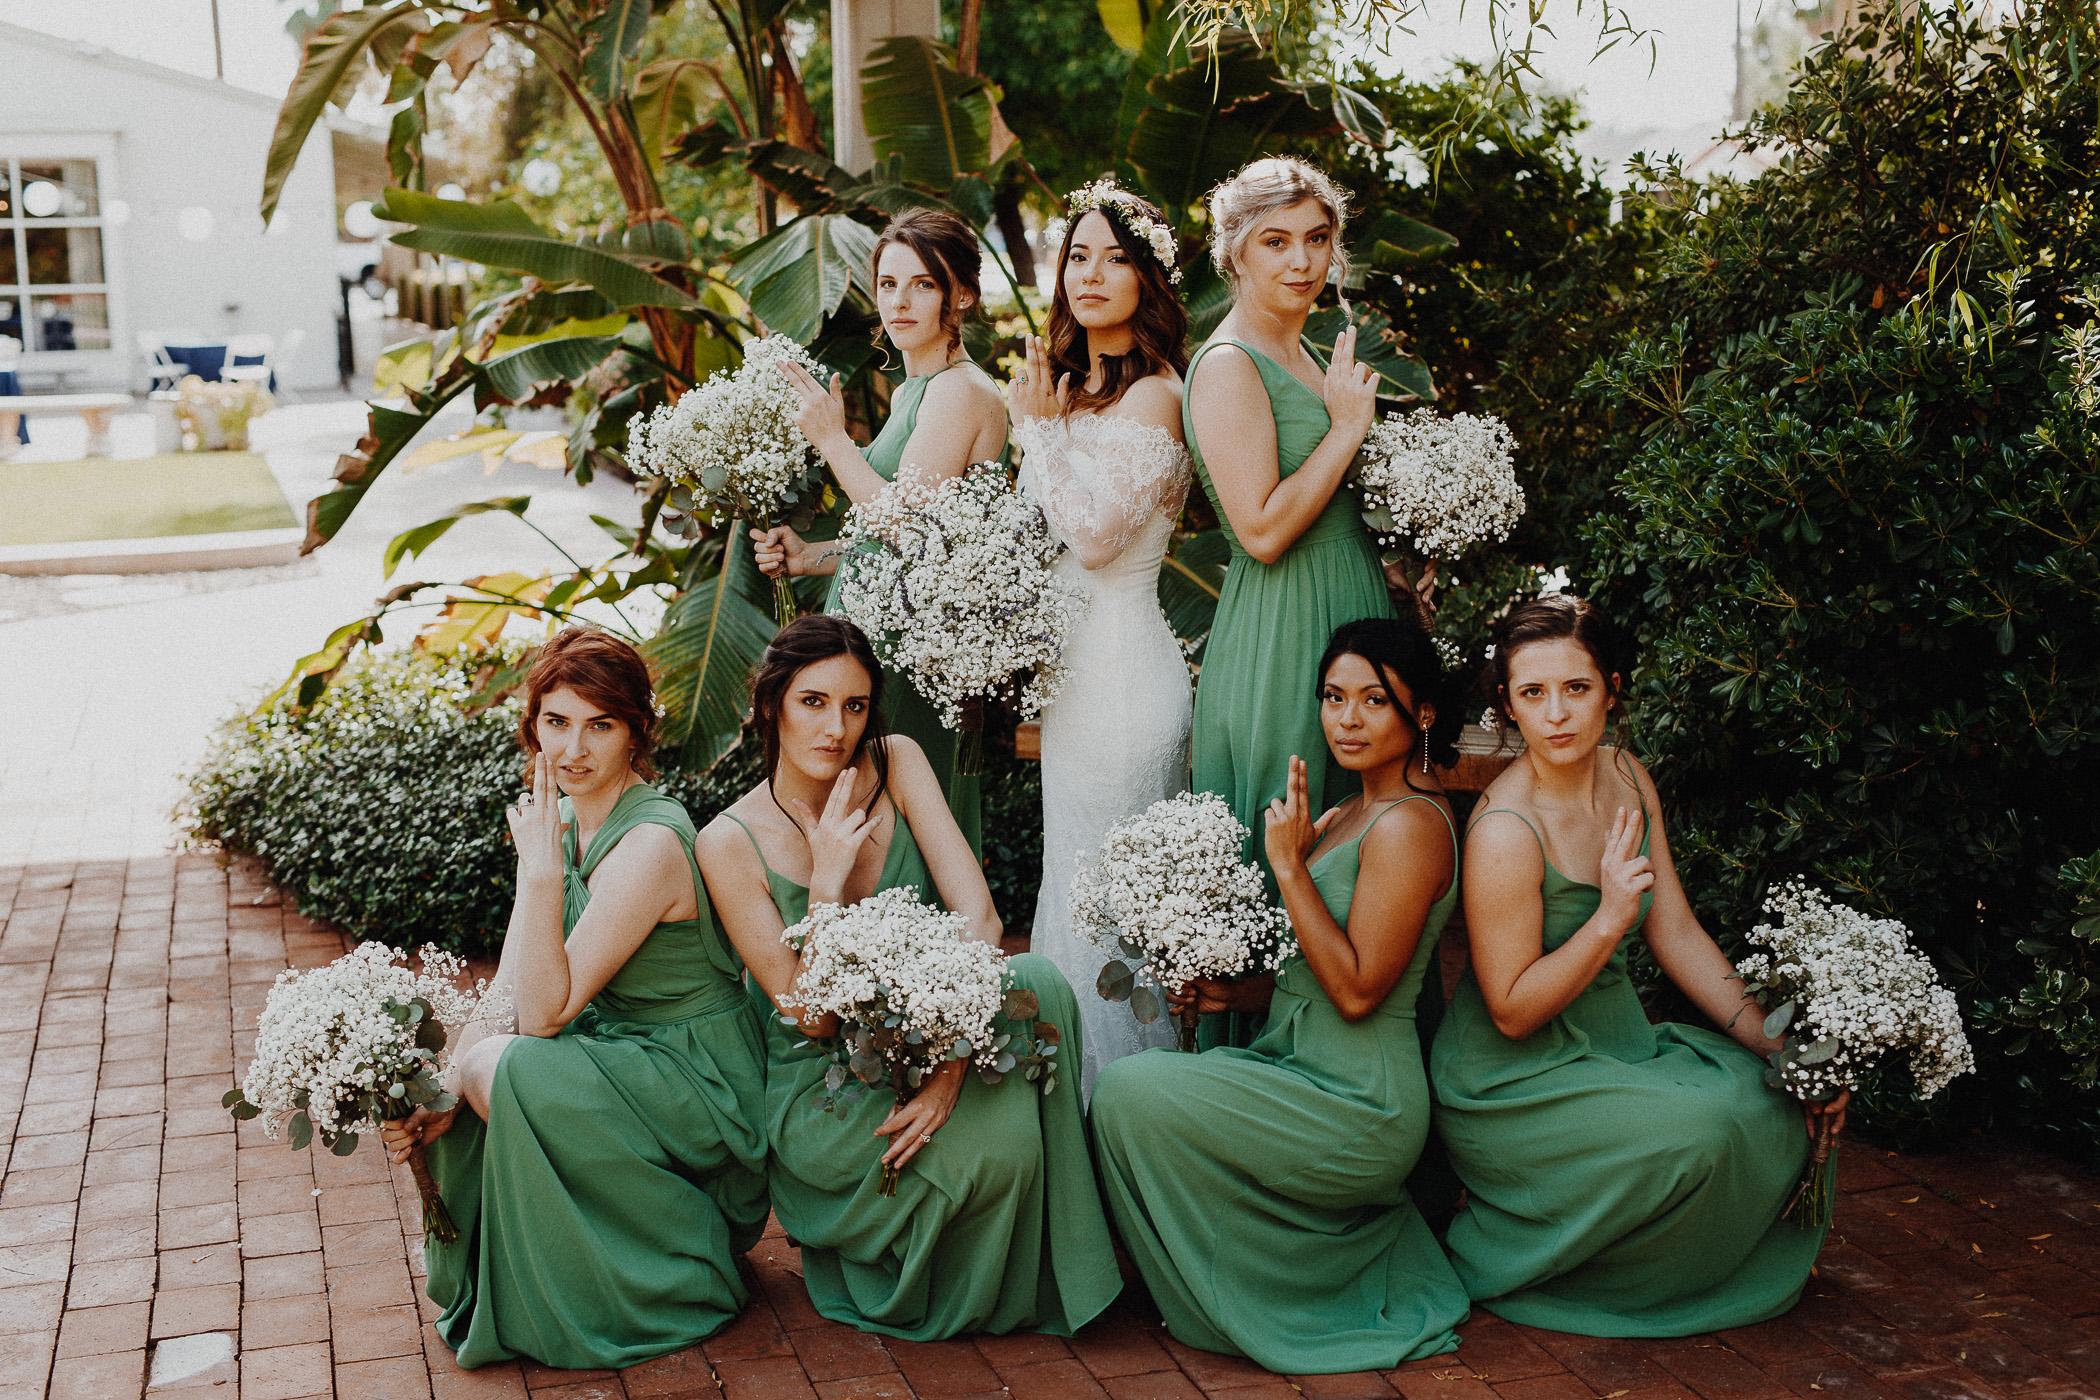 181104-Luxium-Weddings-Arizona-@matt__Le-Brandon-Kariana-Phoenix-Valley-Garden-Center-1021.jpg